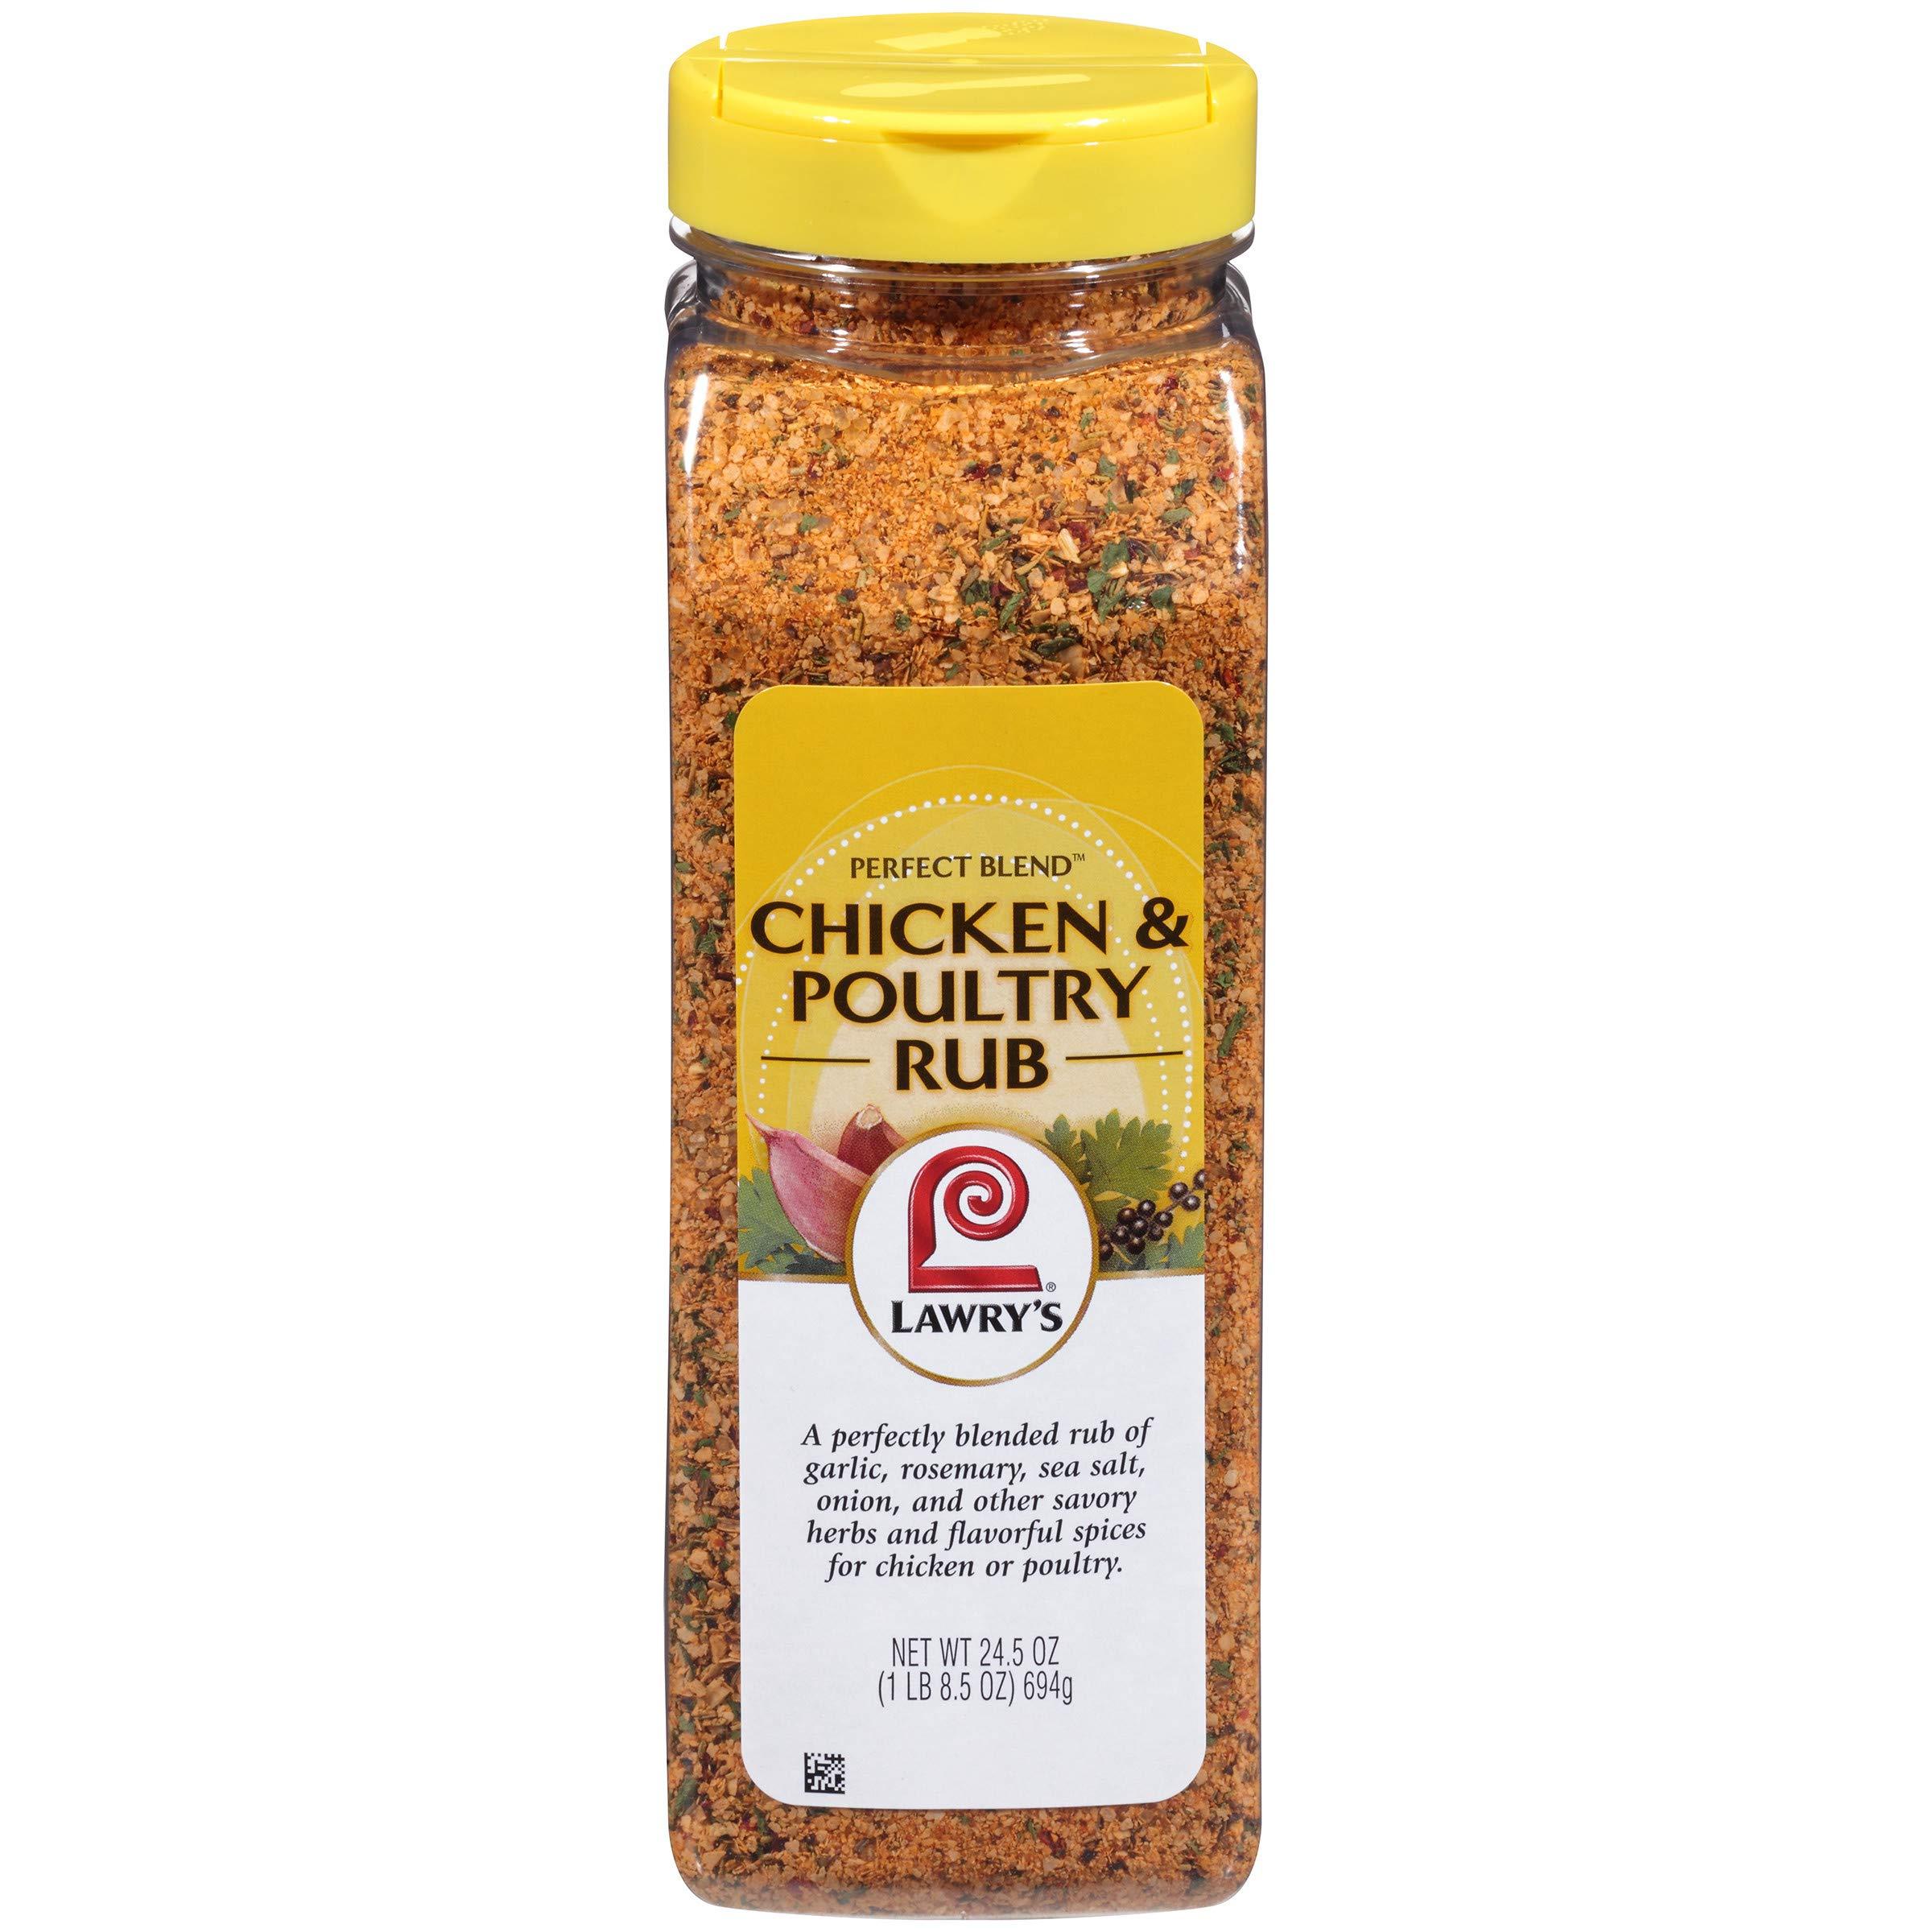 Lawry's Perfect Blend Chicken Rub And Seasoning, 24.5 oz